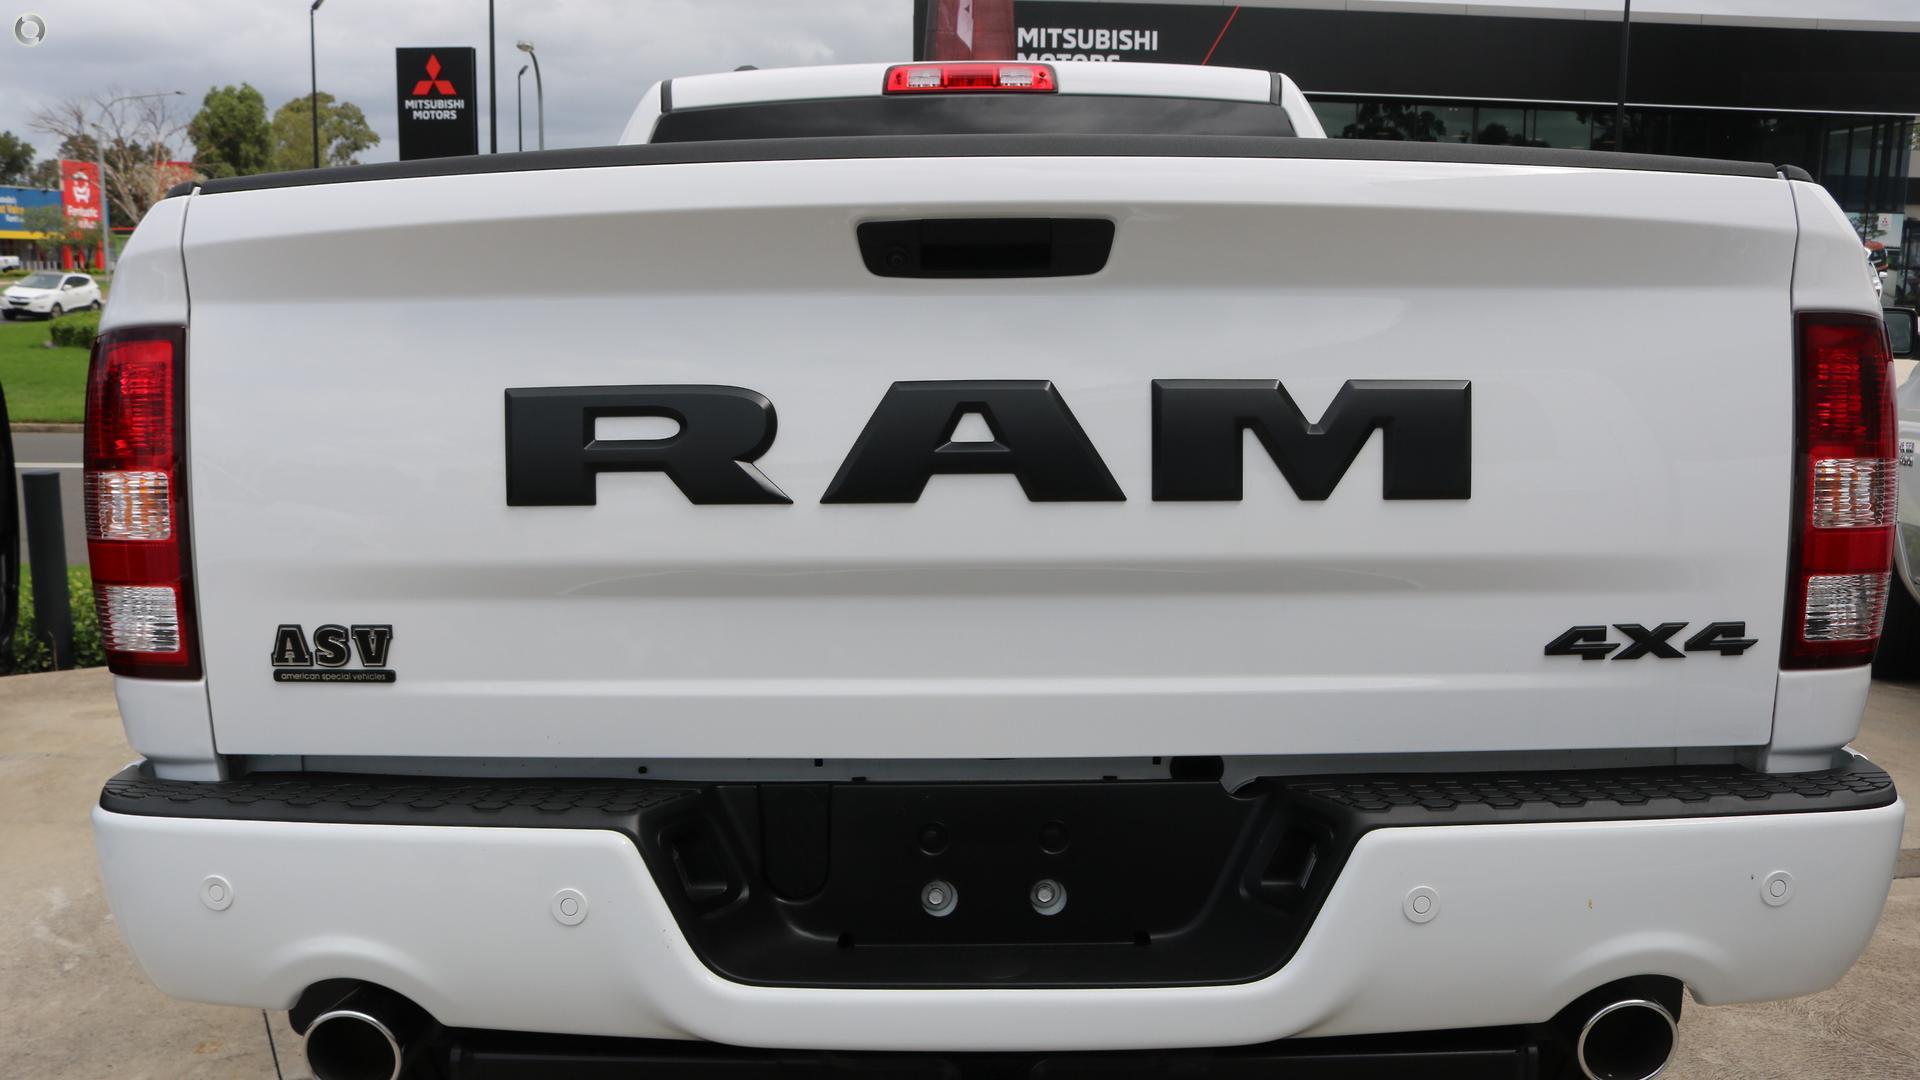 2019 Ram 1500 Express (No Series)